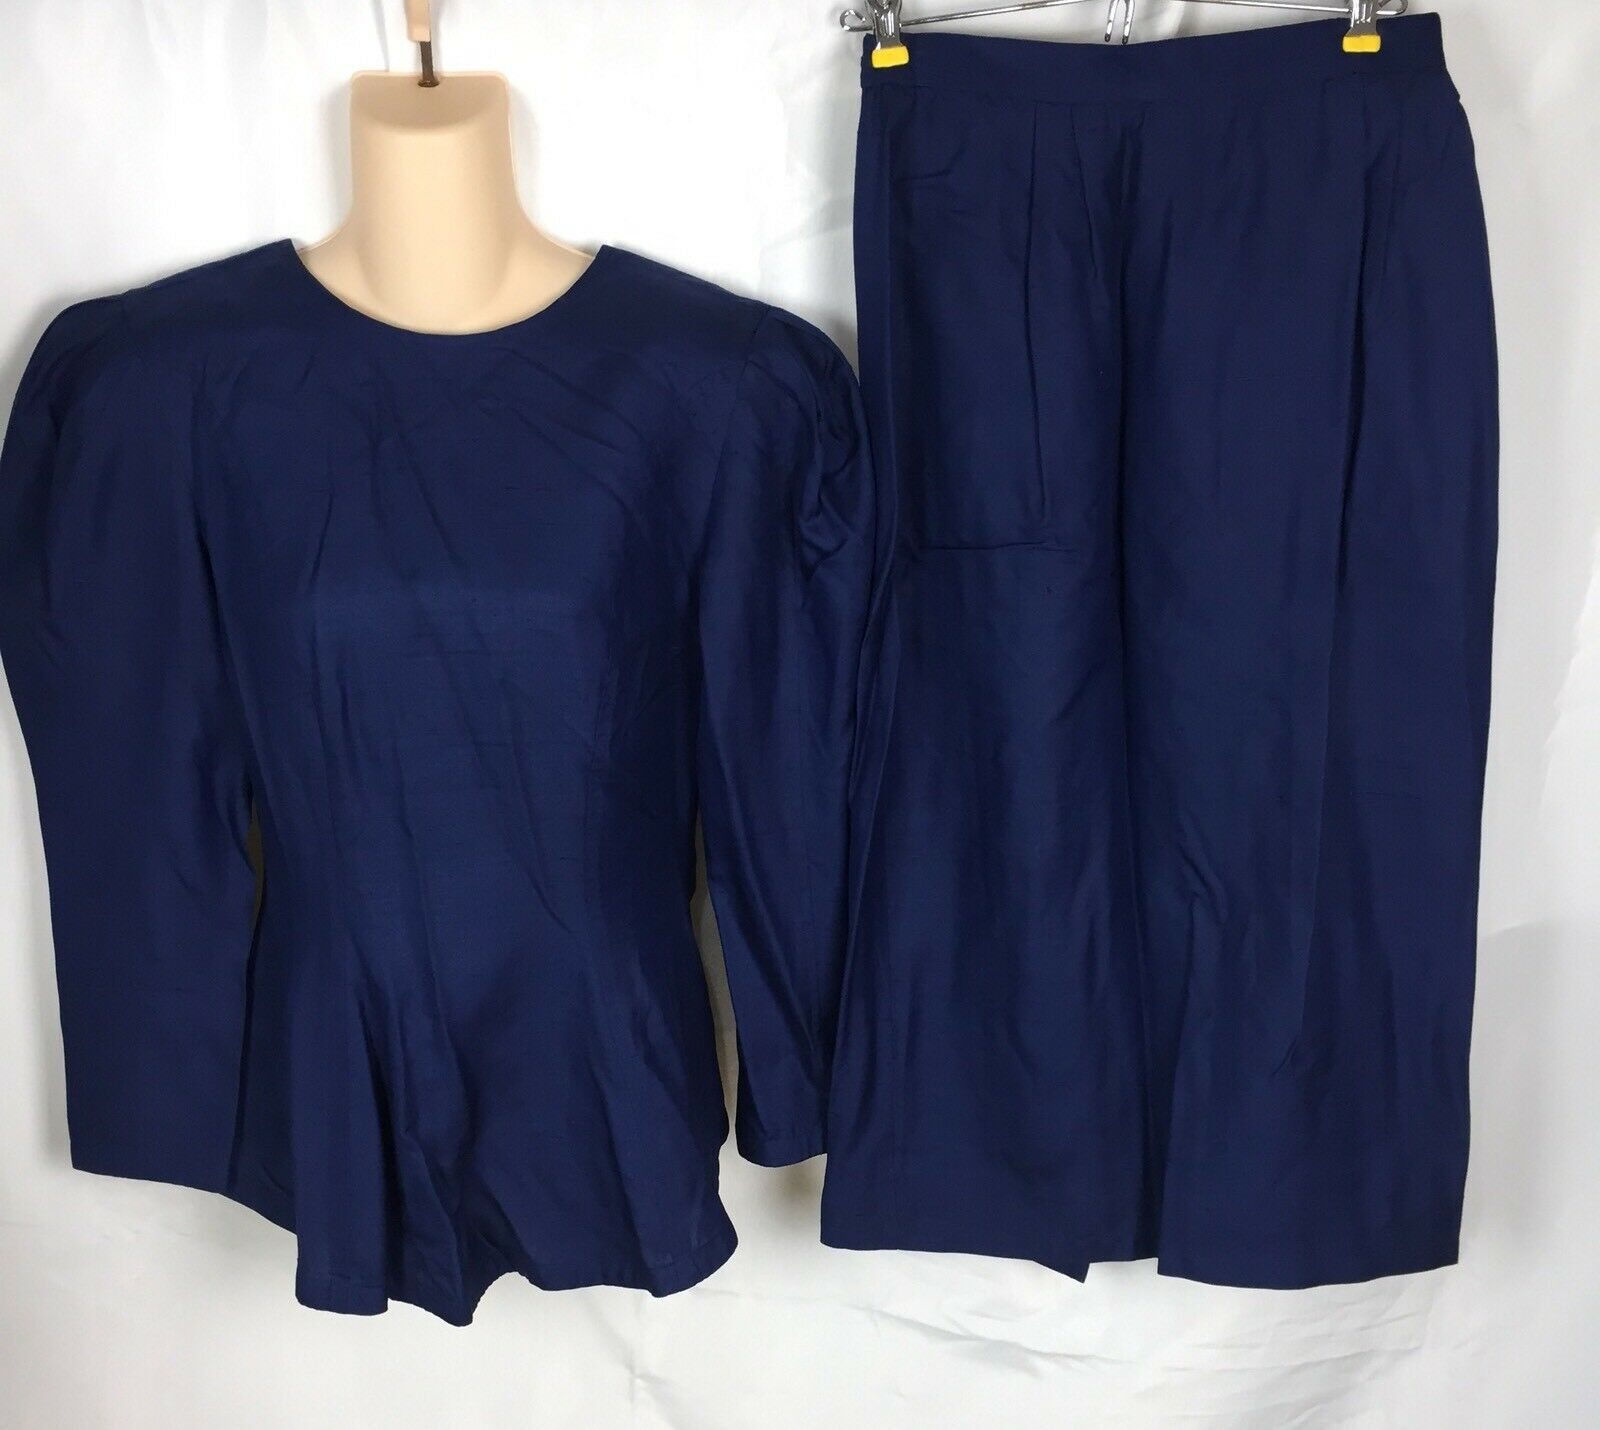 Vtg 80s Joanie Char 100% Silk Navy bluee Puffy Sleeves Skirt Dress Bow Women's 6